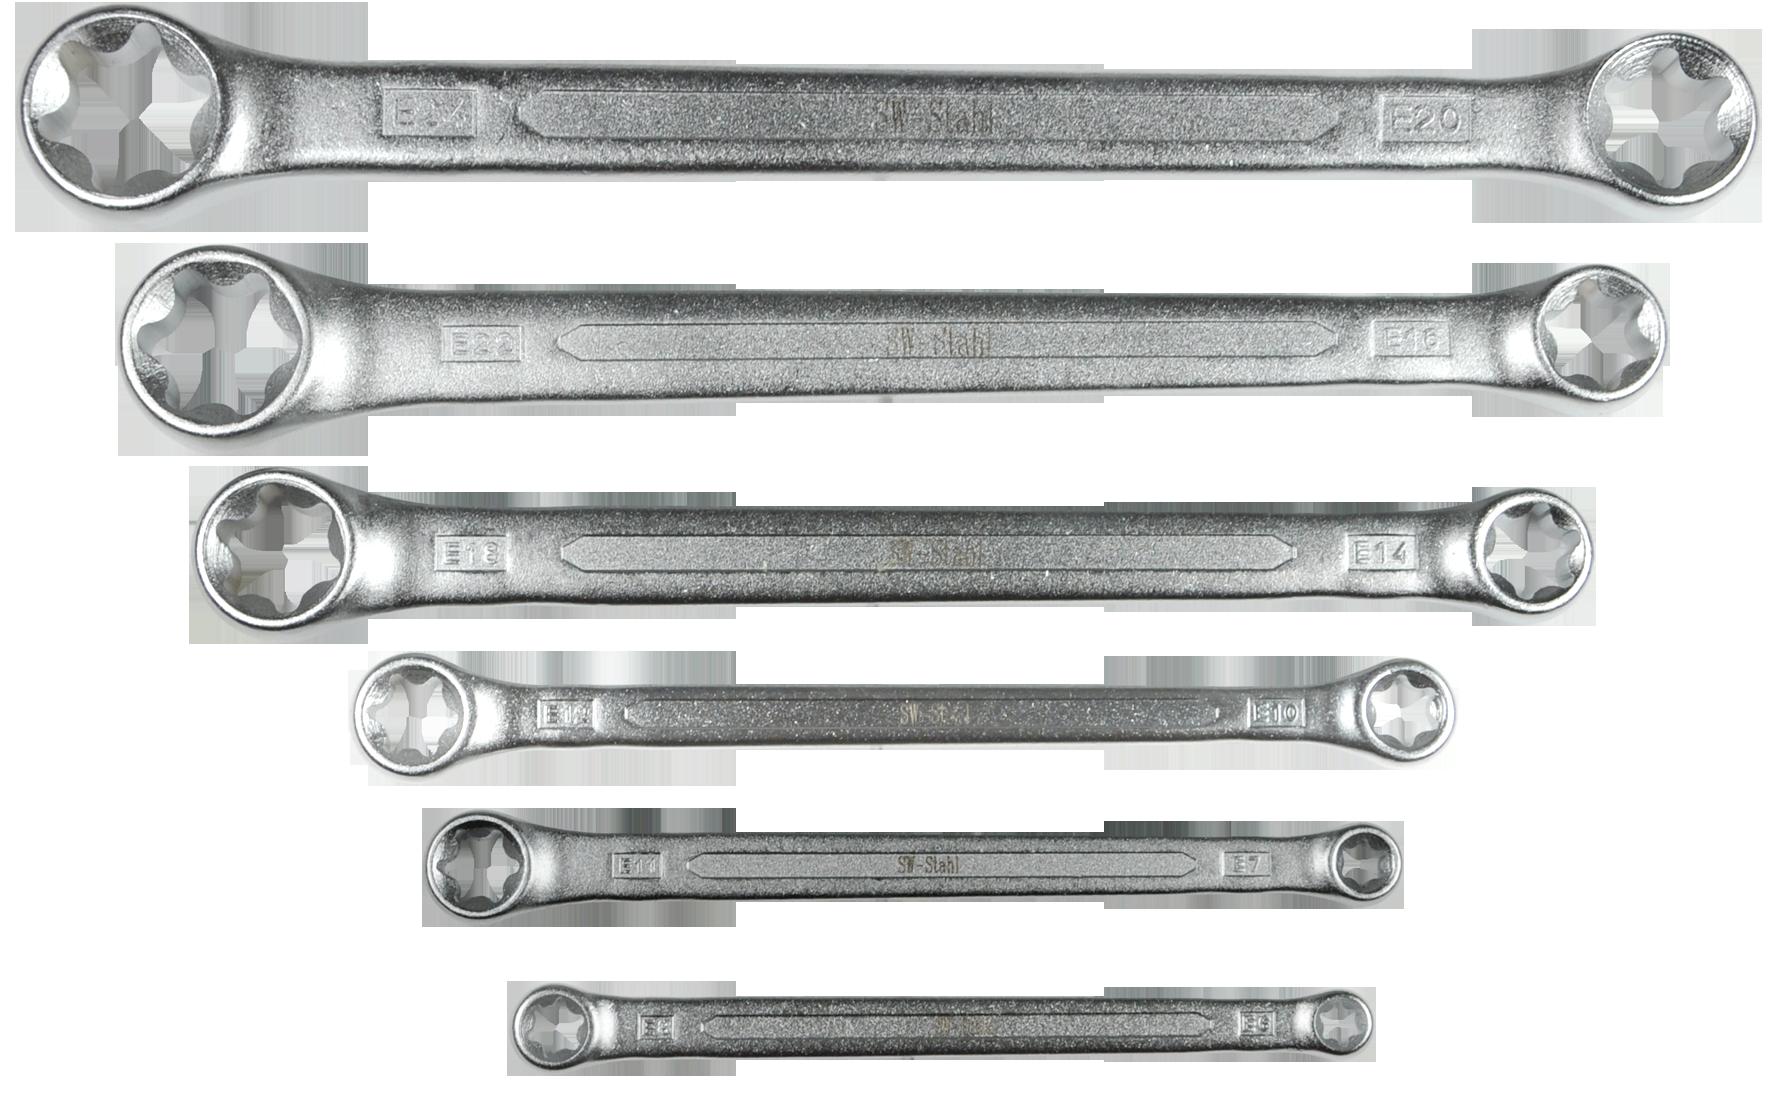 SWSTAHL Doppelringschlüsselsatz, E10-E24 gekröpft, 6-teilig 01560L